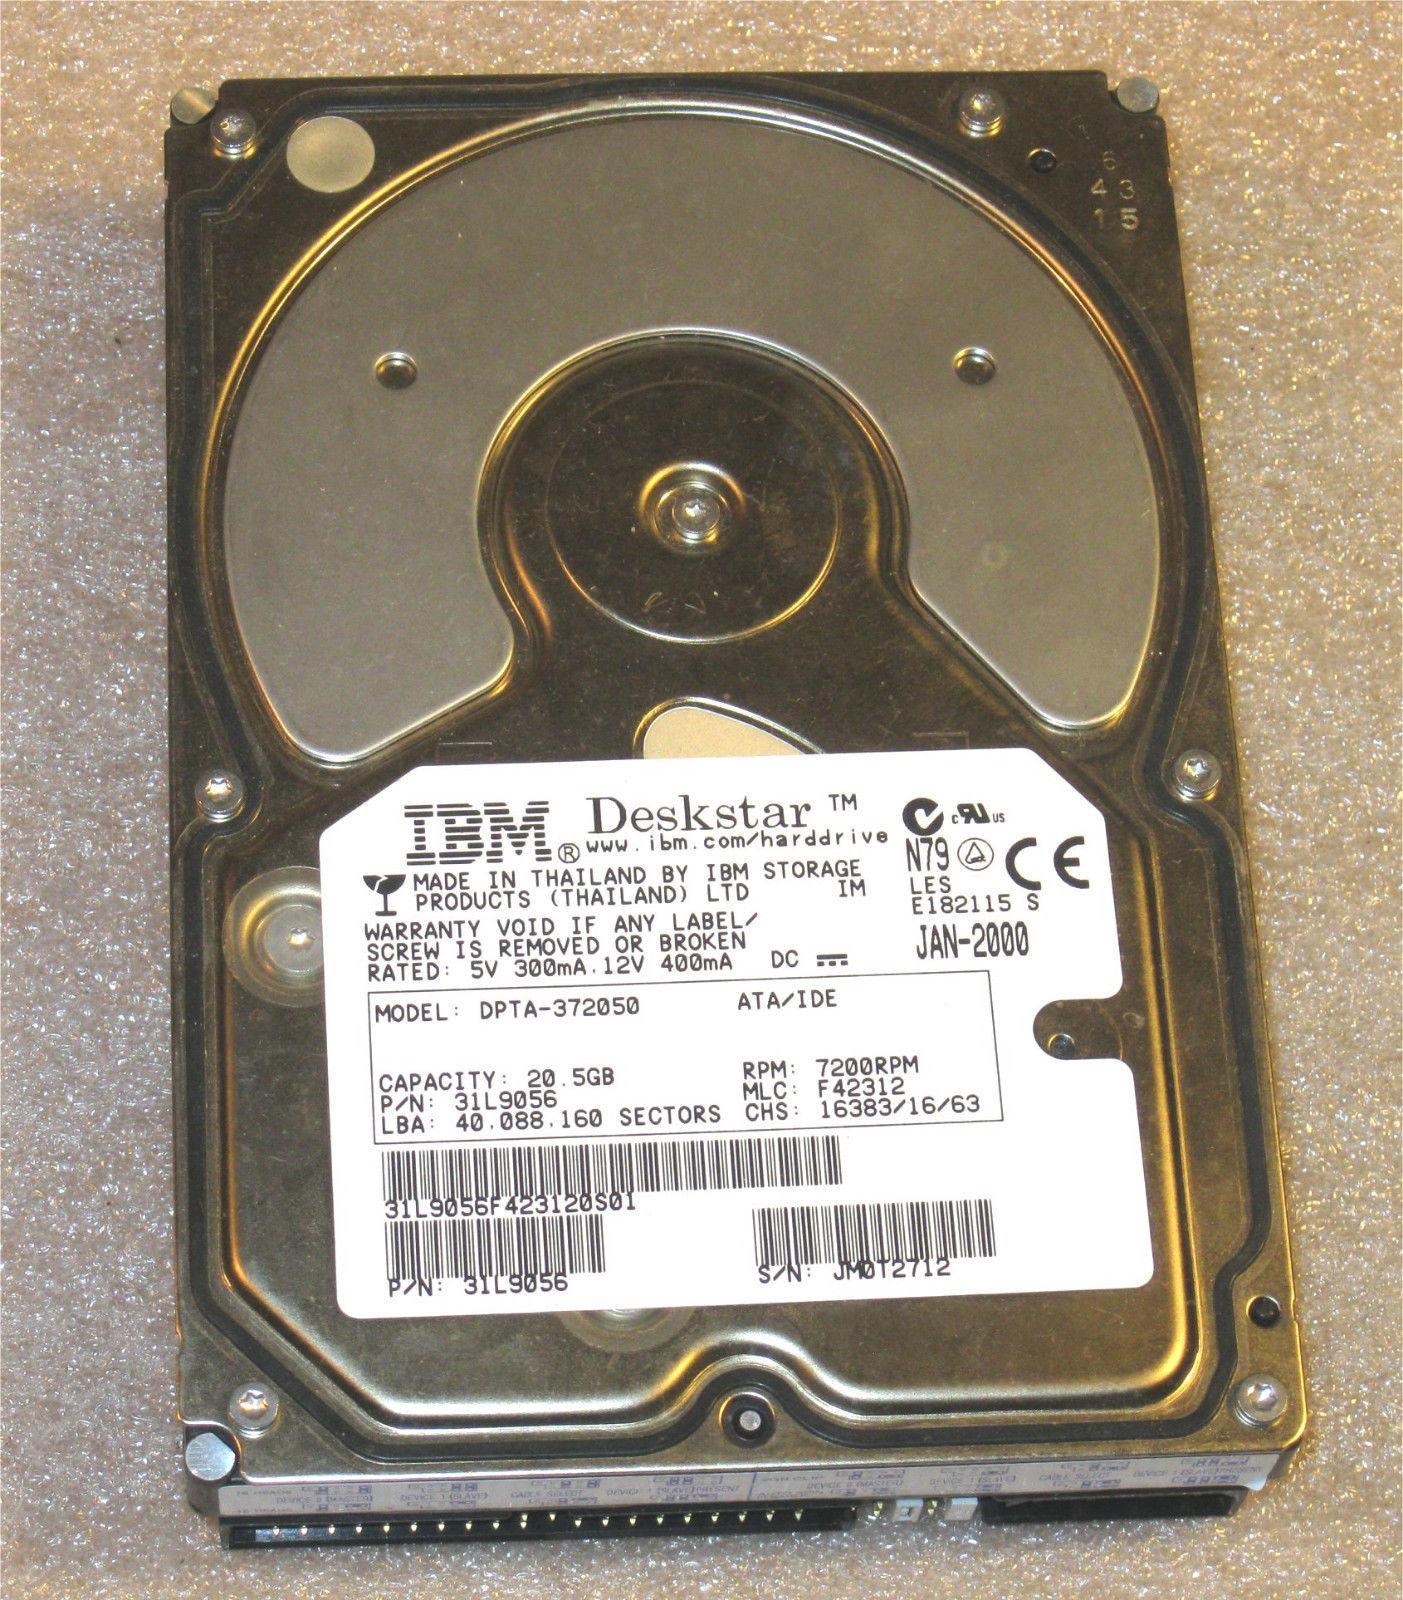 IBM Deskstar DPTA-372050 HDD Hard Disk Drive and 50 similar